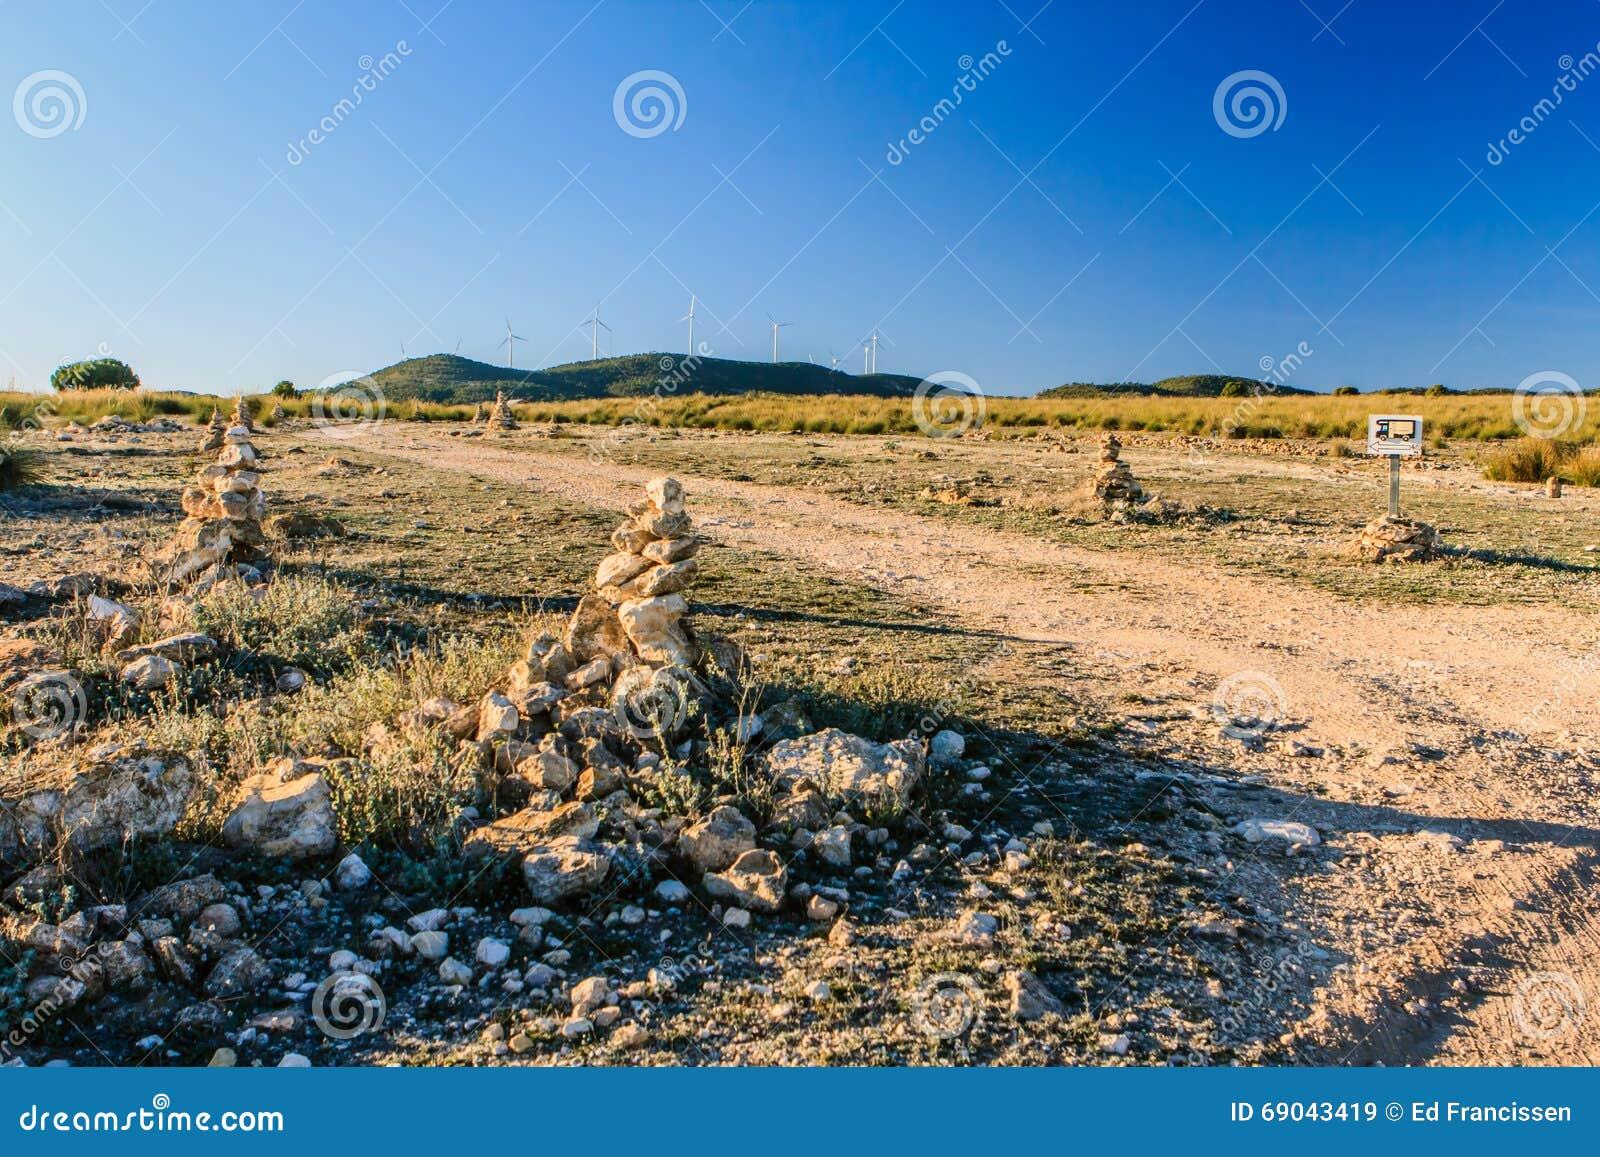 Map Of Yecla Spain.Yecla Murcia Spain Stock Image Image Of Olive Wasteland 69043419